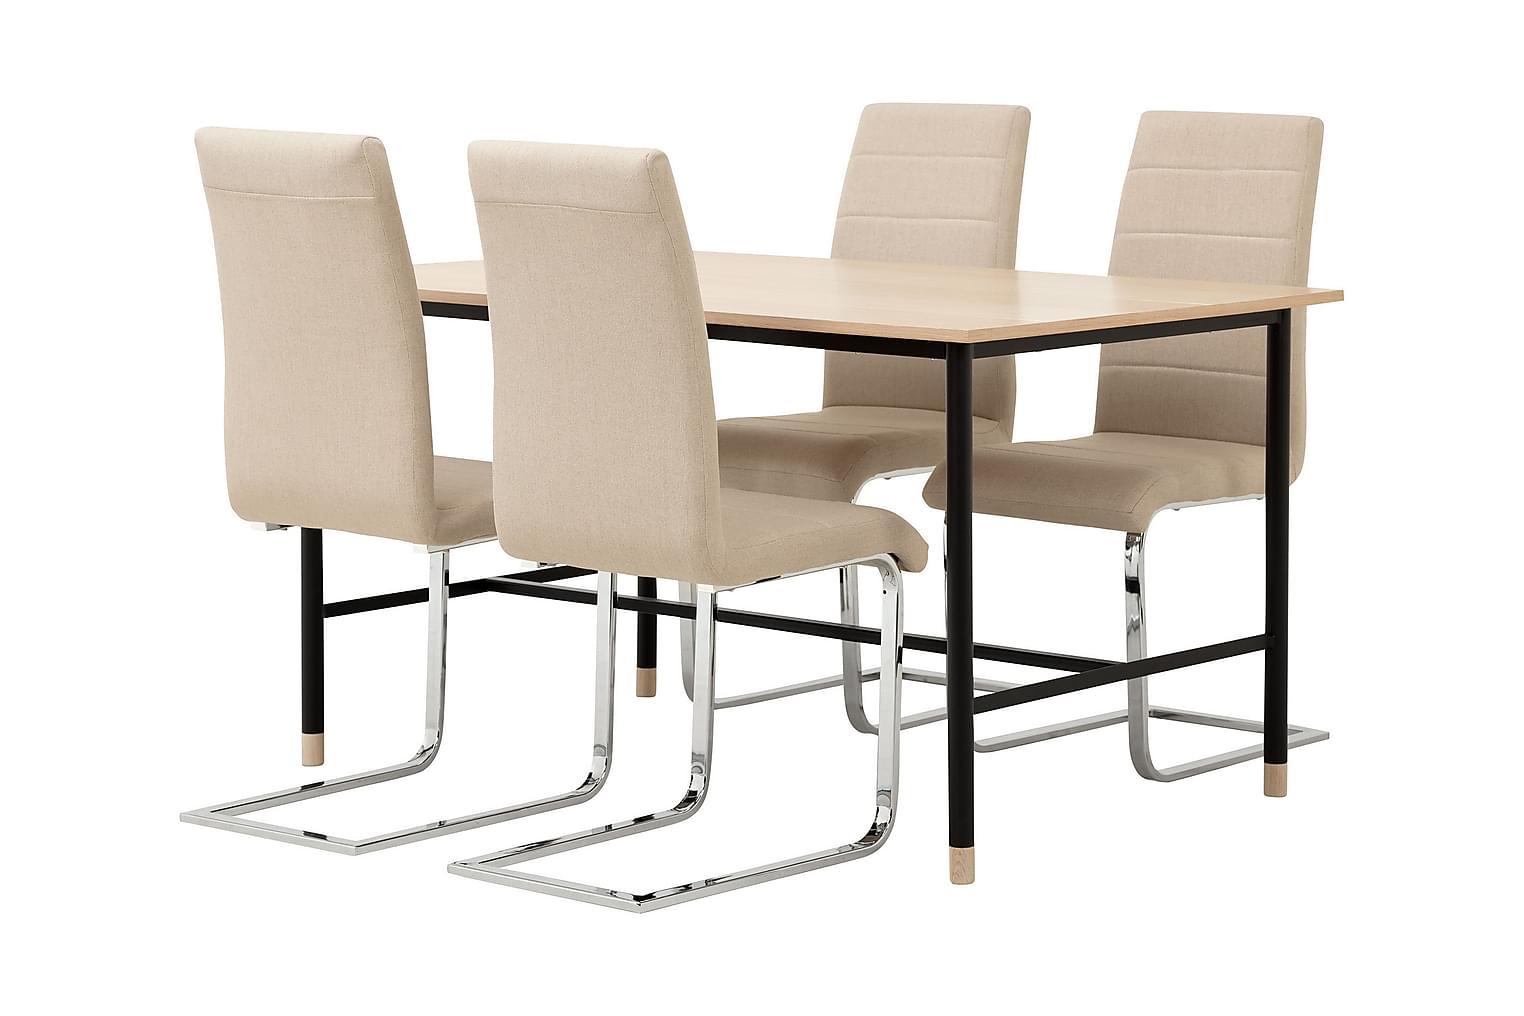 BRANDY Pöytä 138 Tammi/Musta + 4 EMÅN Tuolia Beige